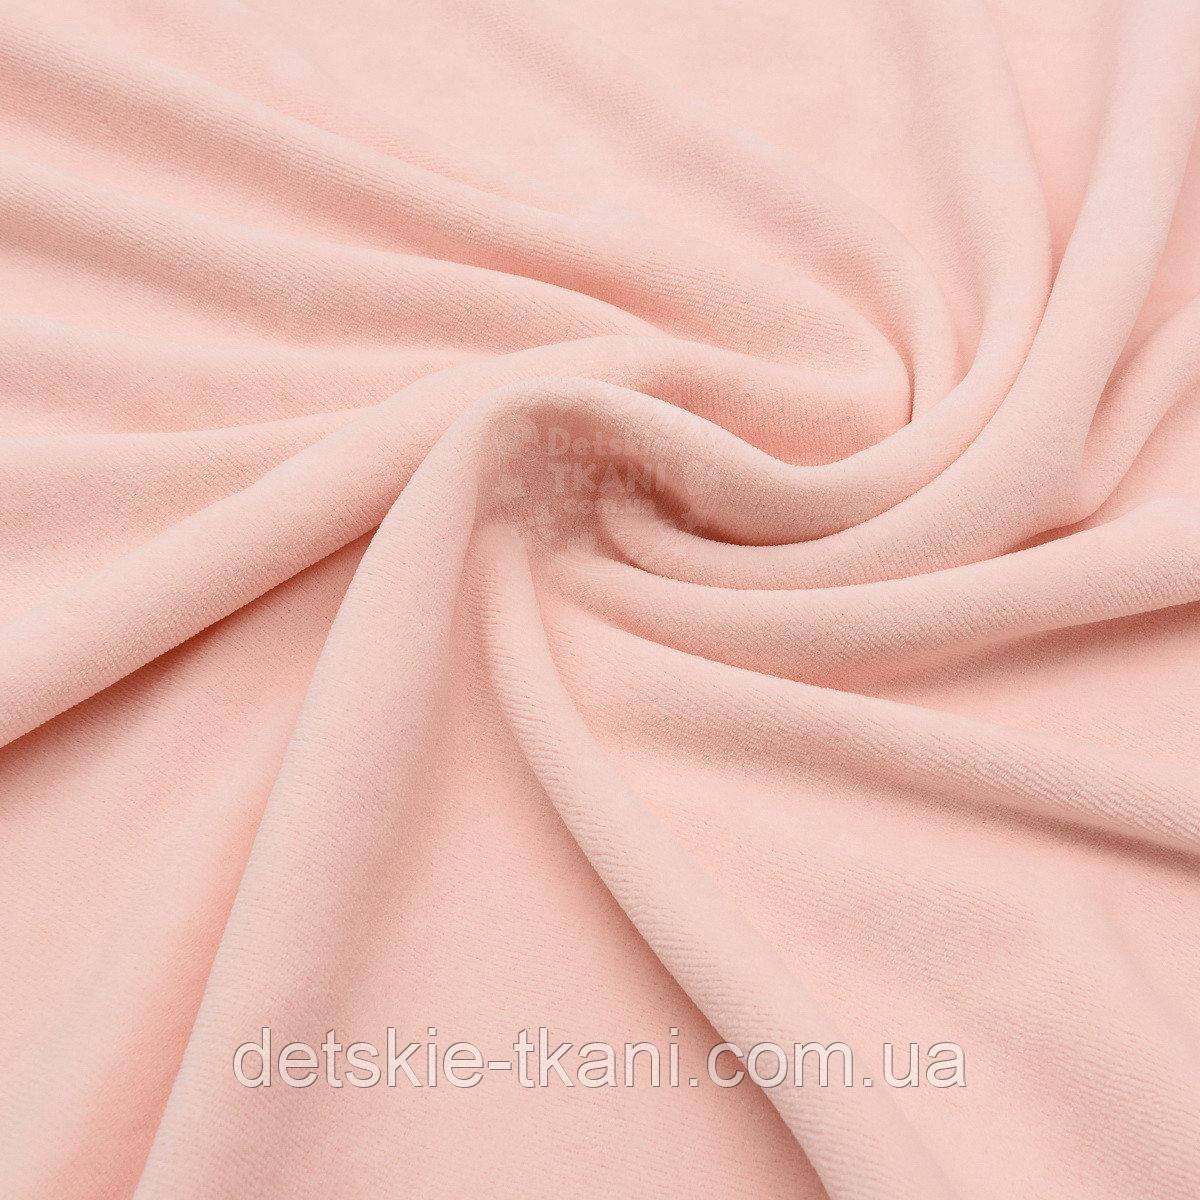 Два лоскута однотонного  ХБ велюра бледно-розового цвета, размер 35*70, 35*80 см